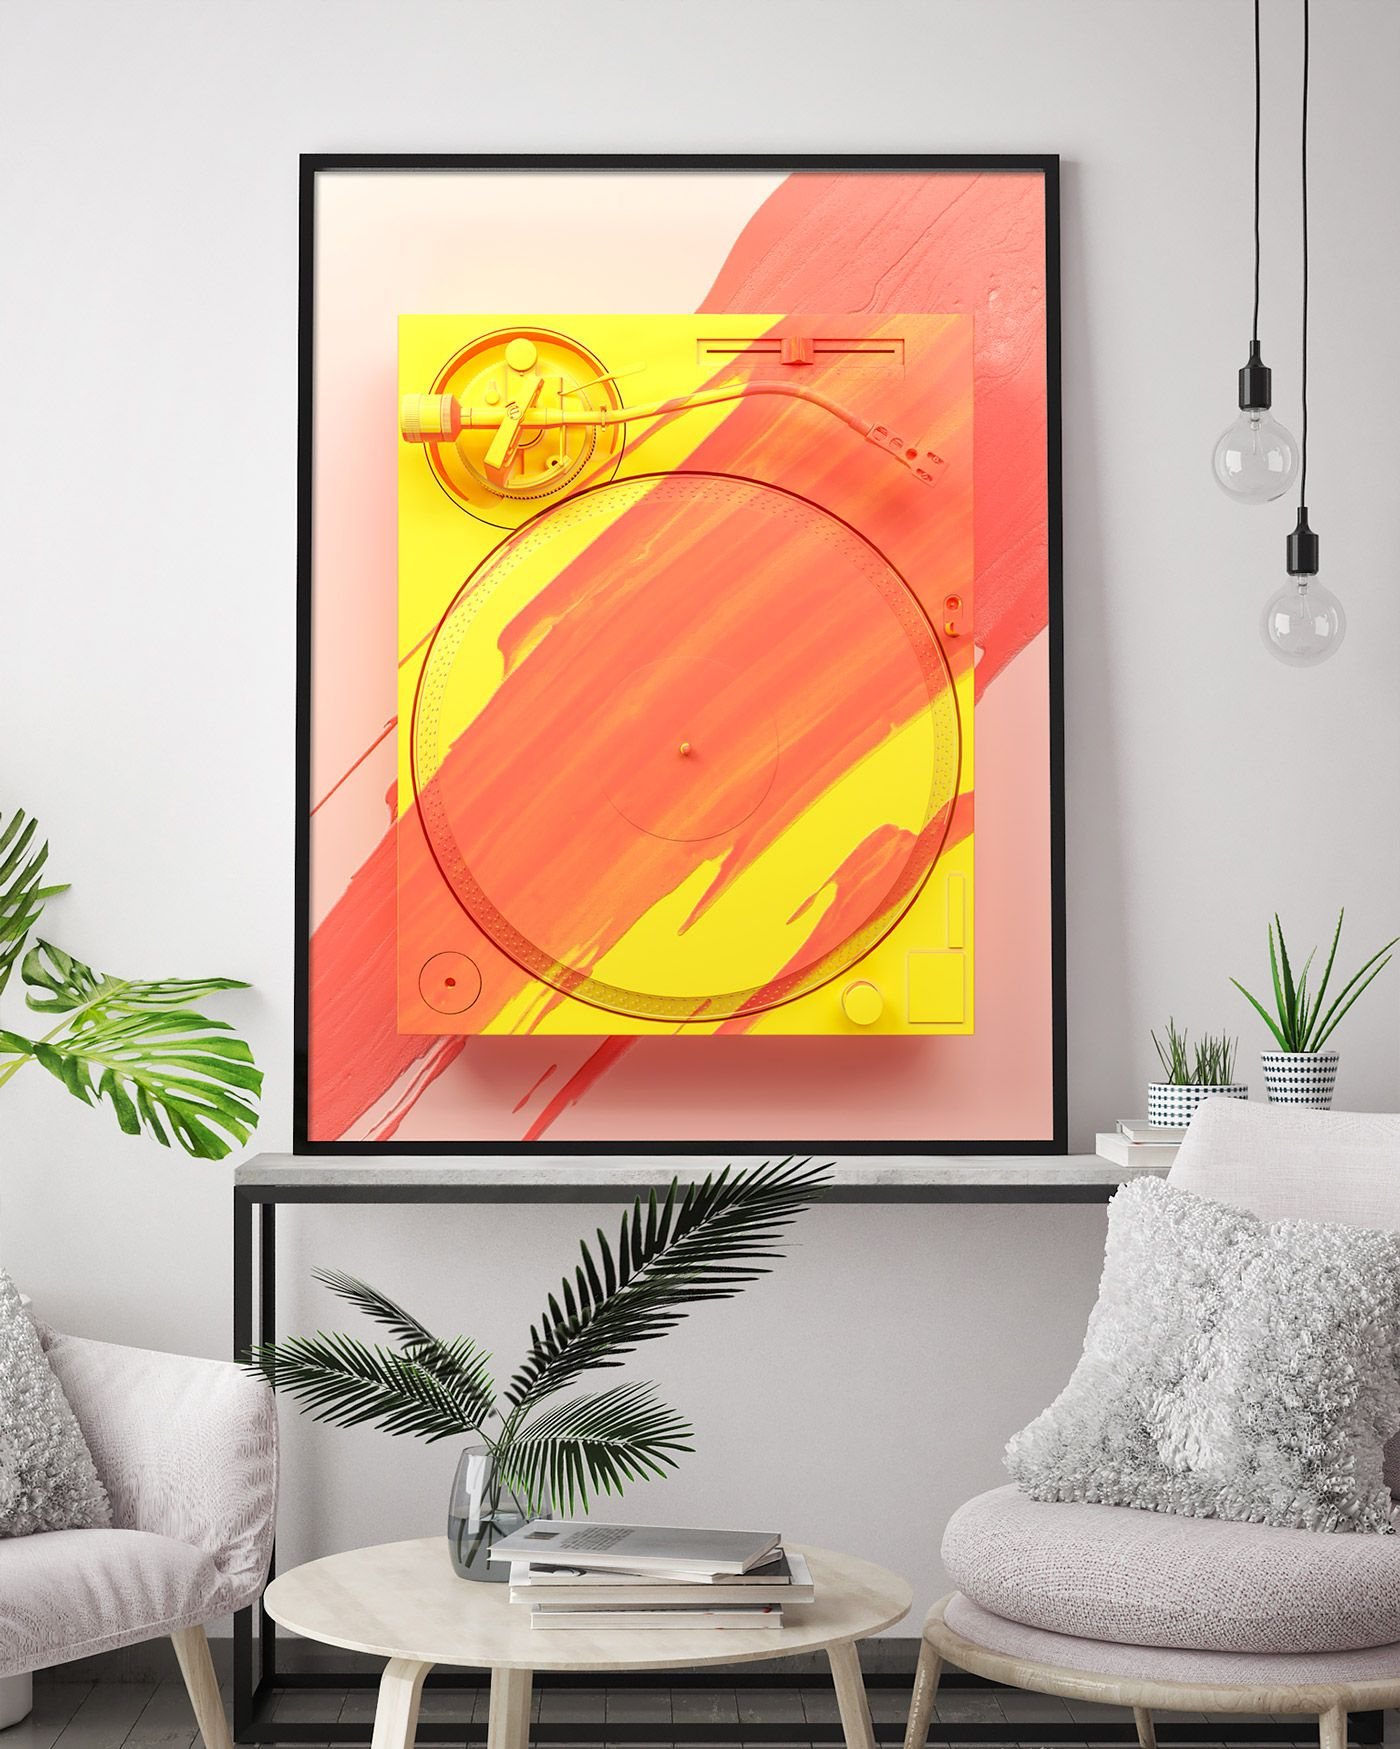 Painted Objects: 3D Artworks by Ben Fearnley – Inspiration Grid | Design Inspiration #art #artwork #wallart #print #poster #canvas #inspirationgrid